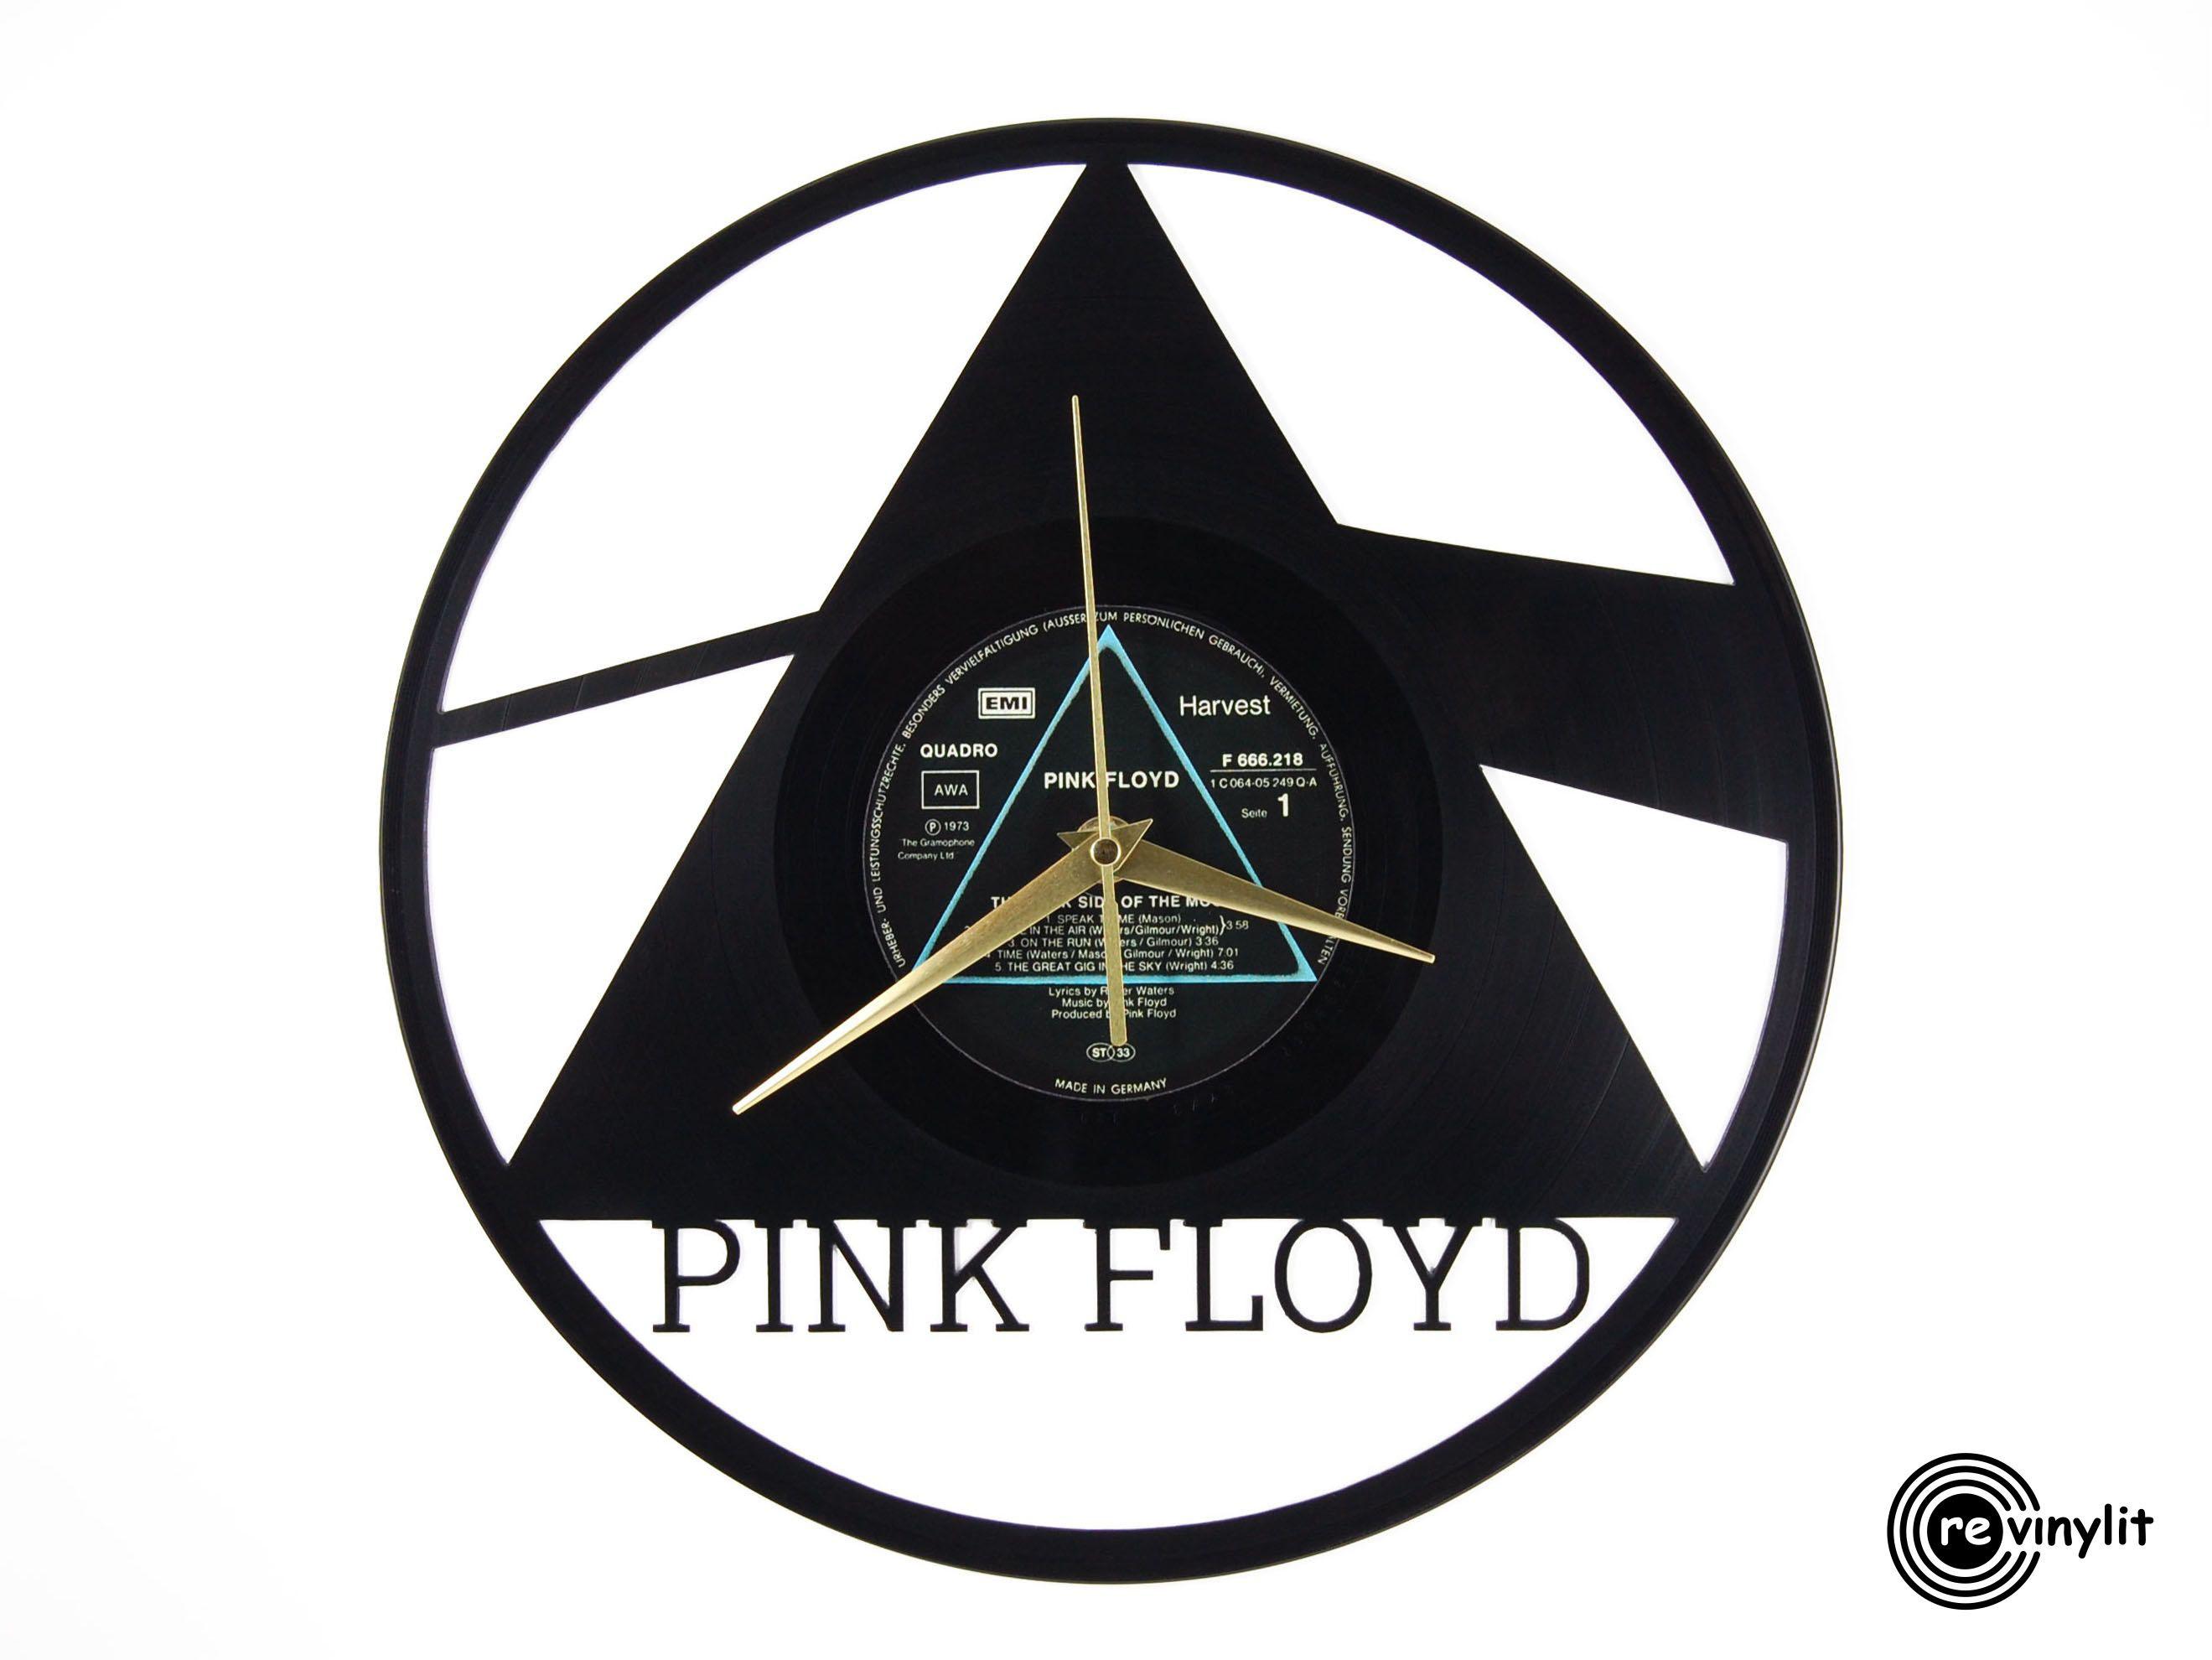 Pink Floyd Dark Side Of the Moon vinyl record clock ||| Revinylit